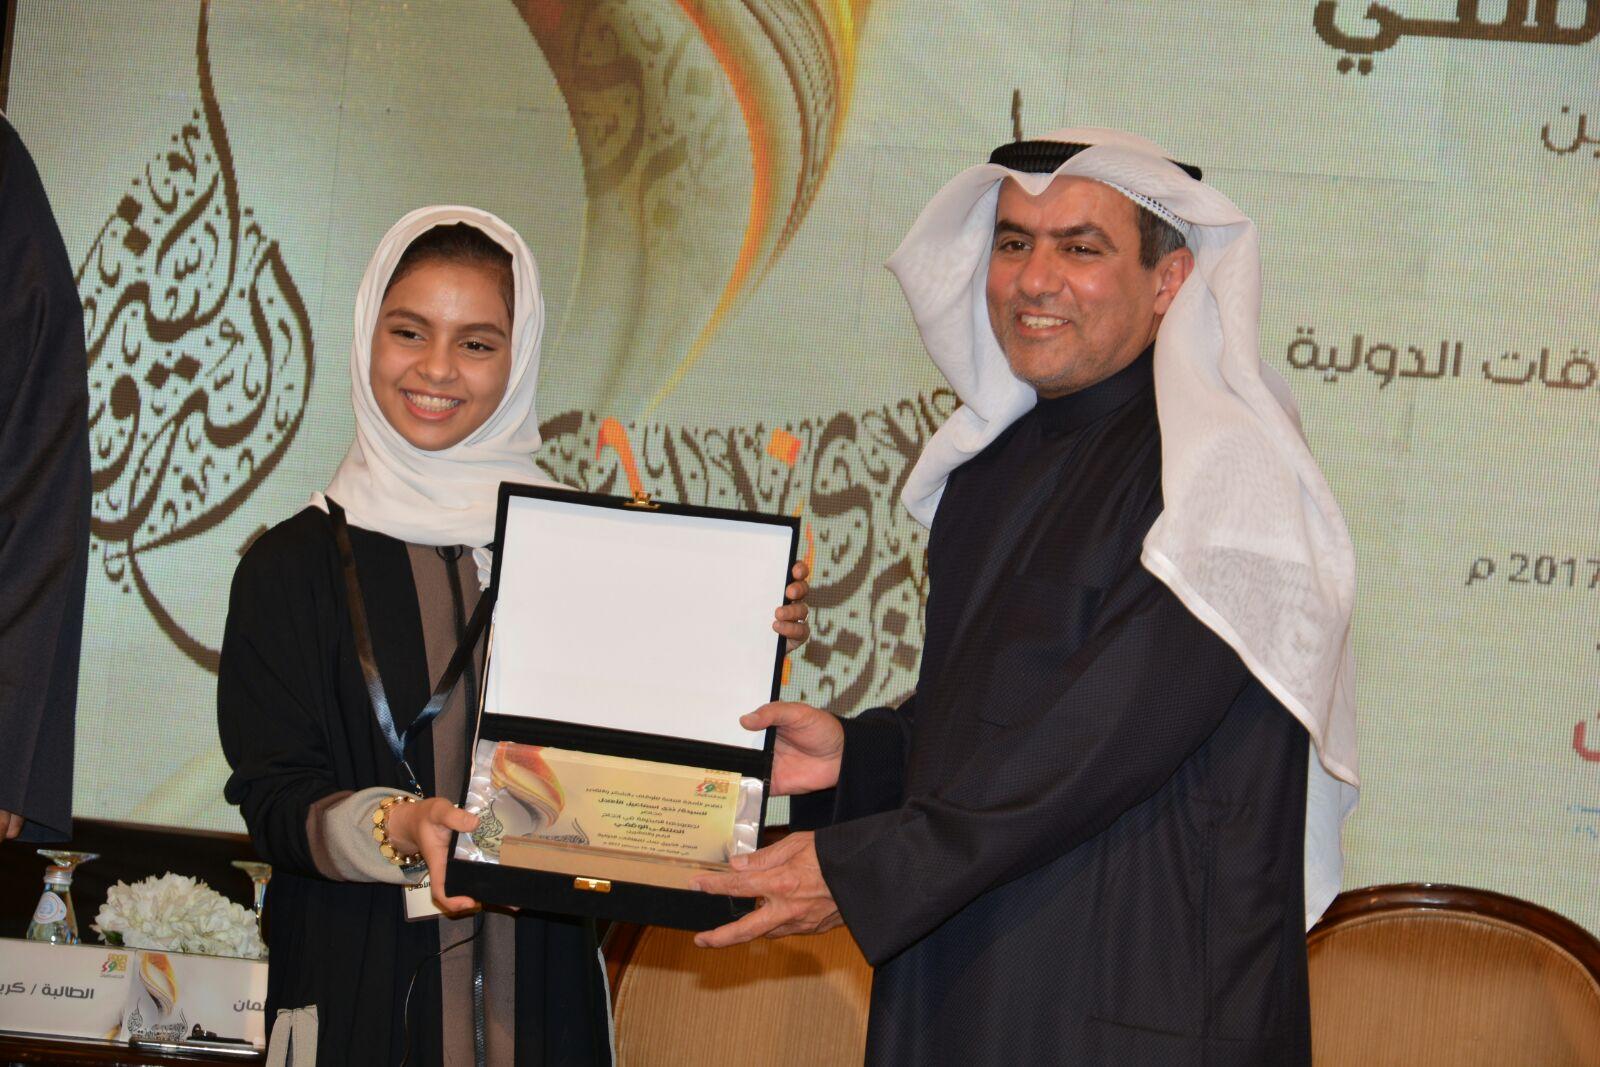 Nada Foundation gets support in Kuwait